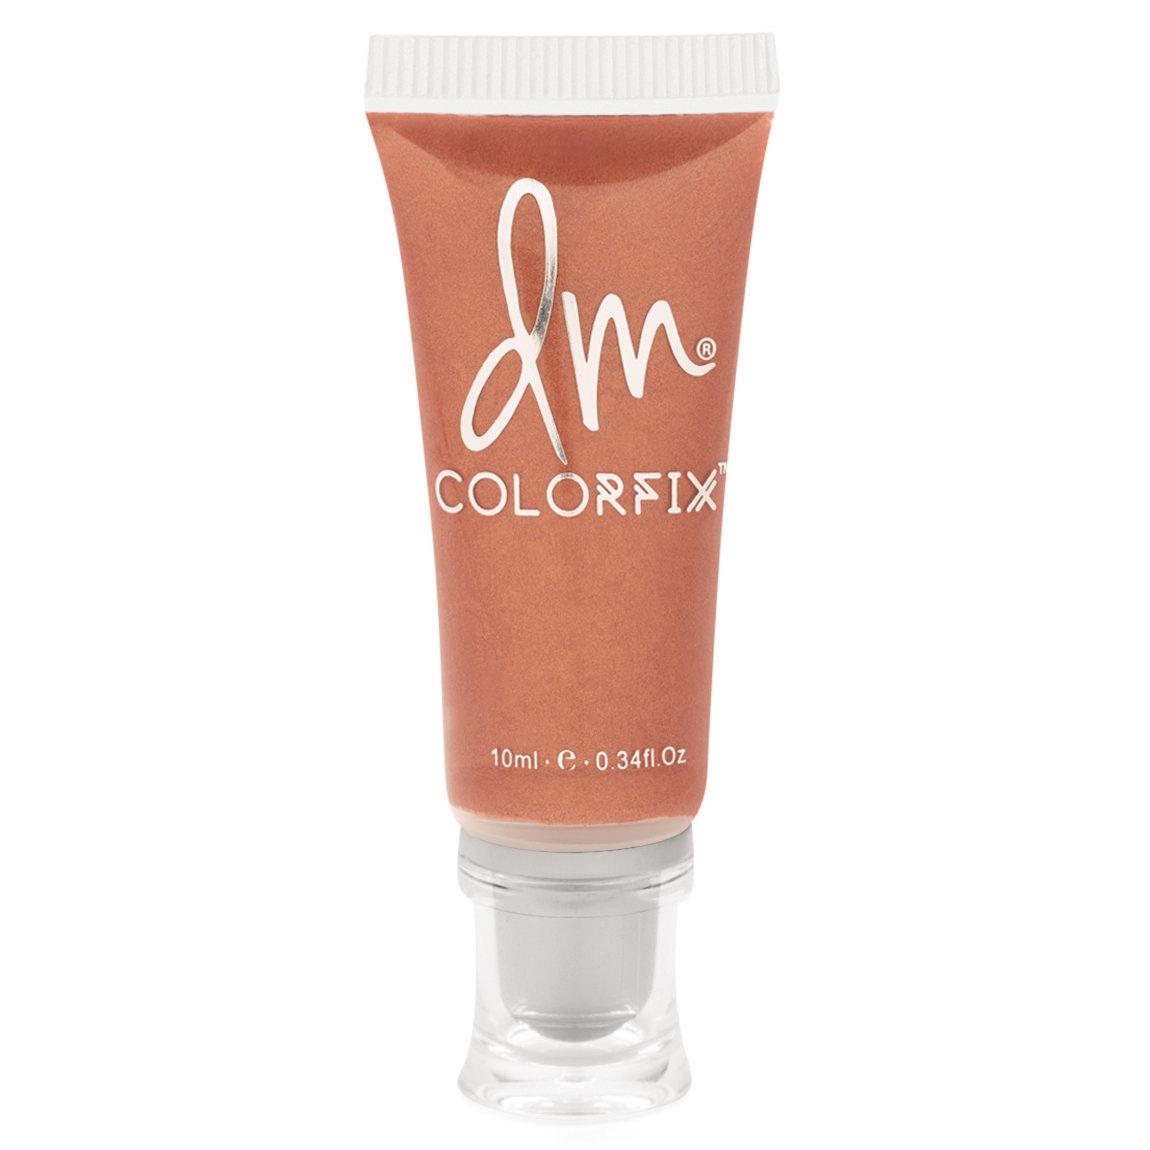 Danessa Myricks Beauty ColorFix 24-Hour Cream Color Metallic Celebration alternative view 1.